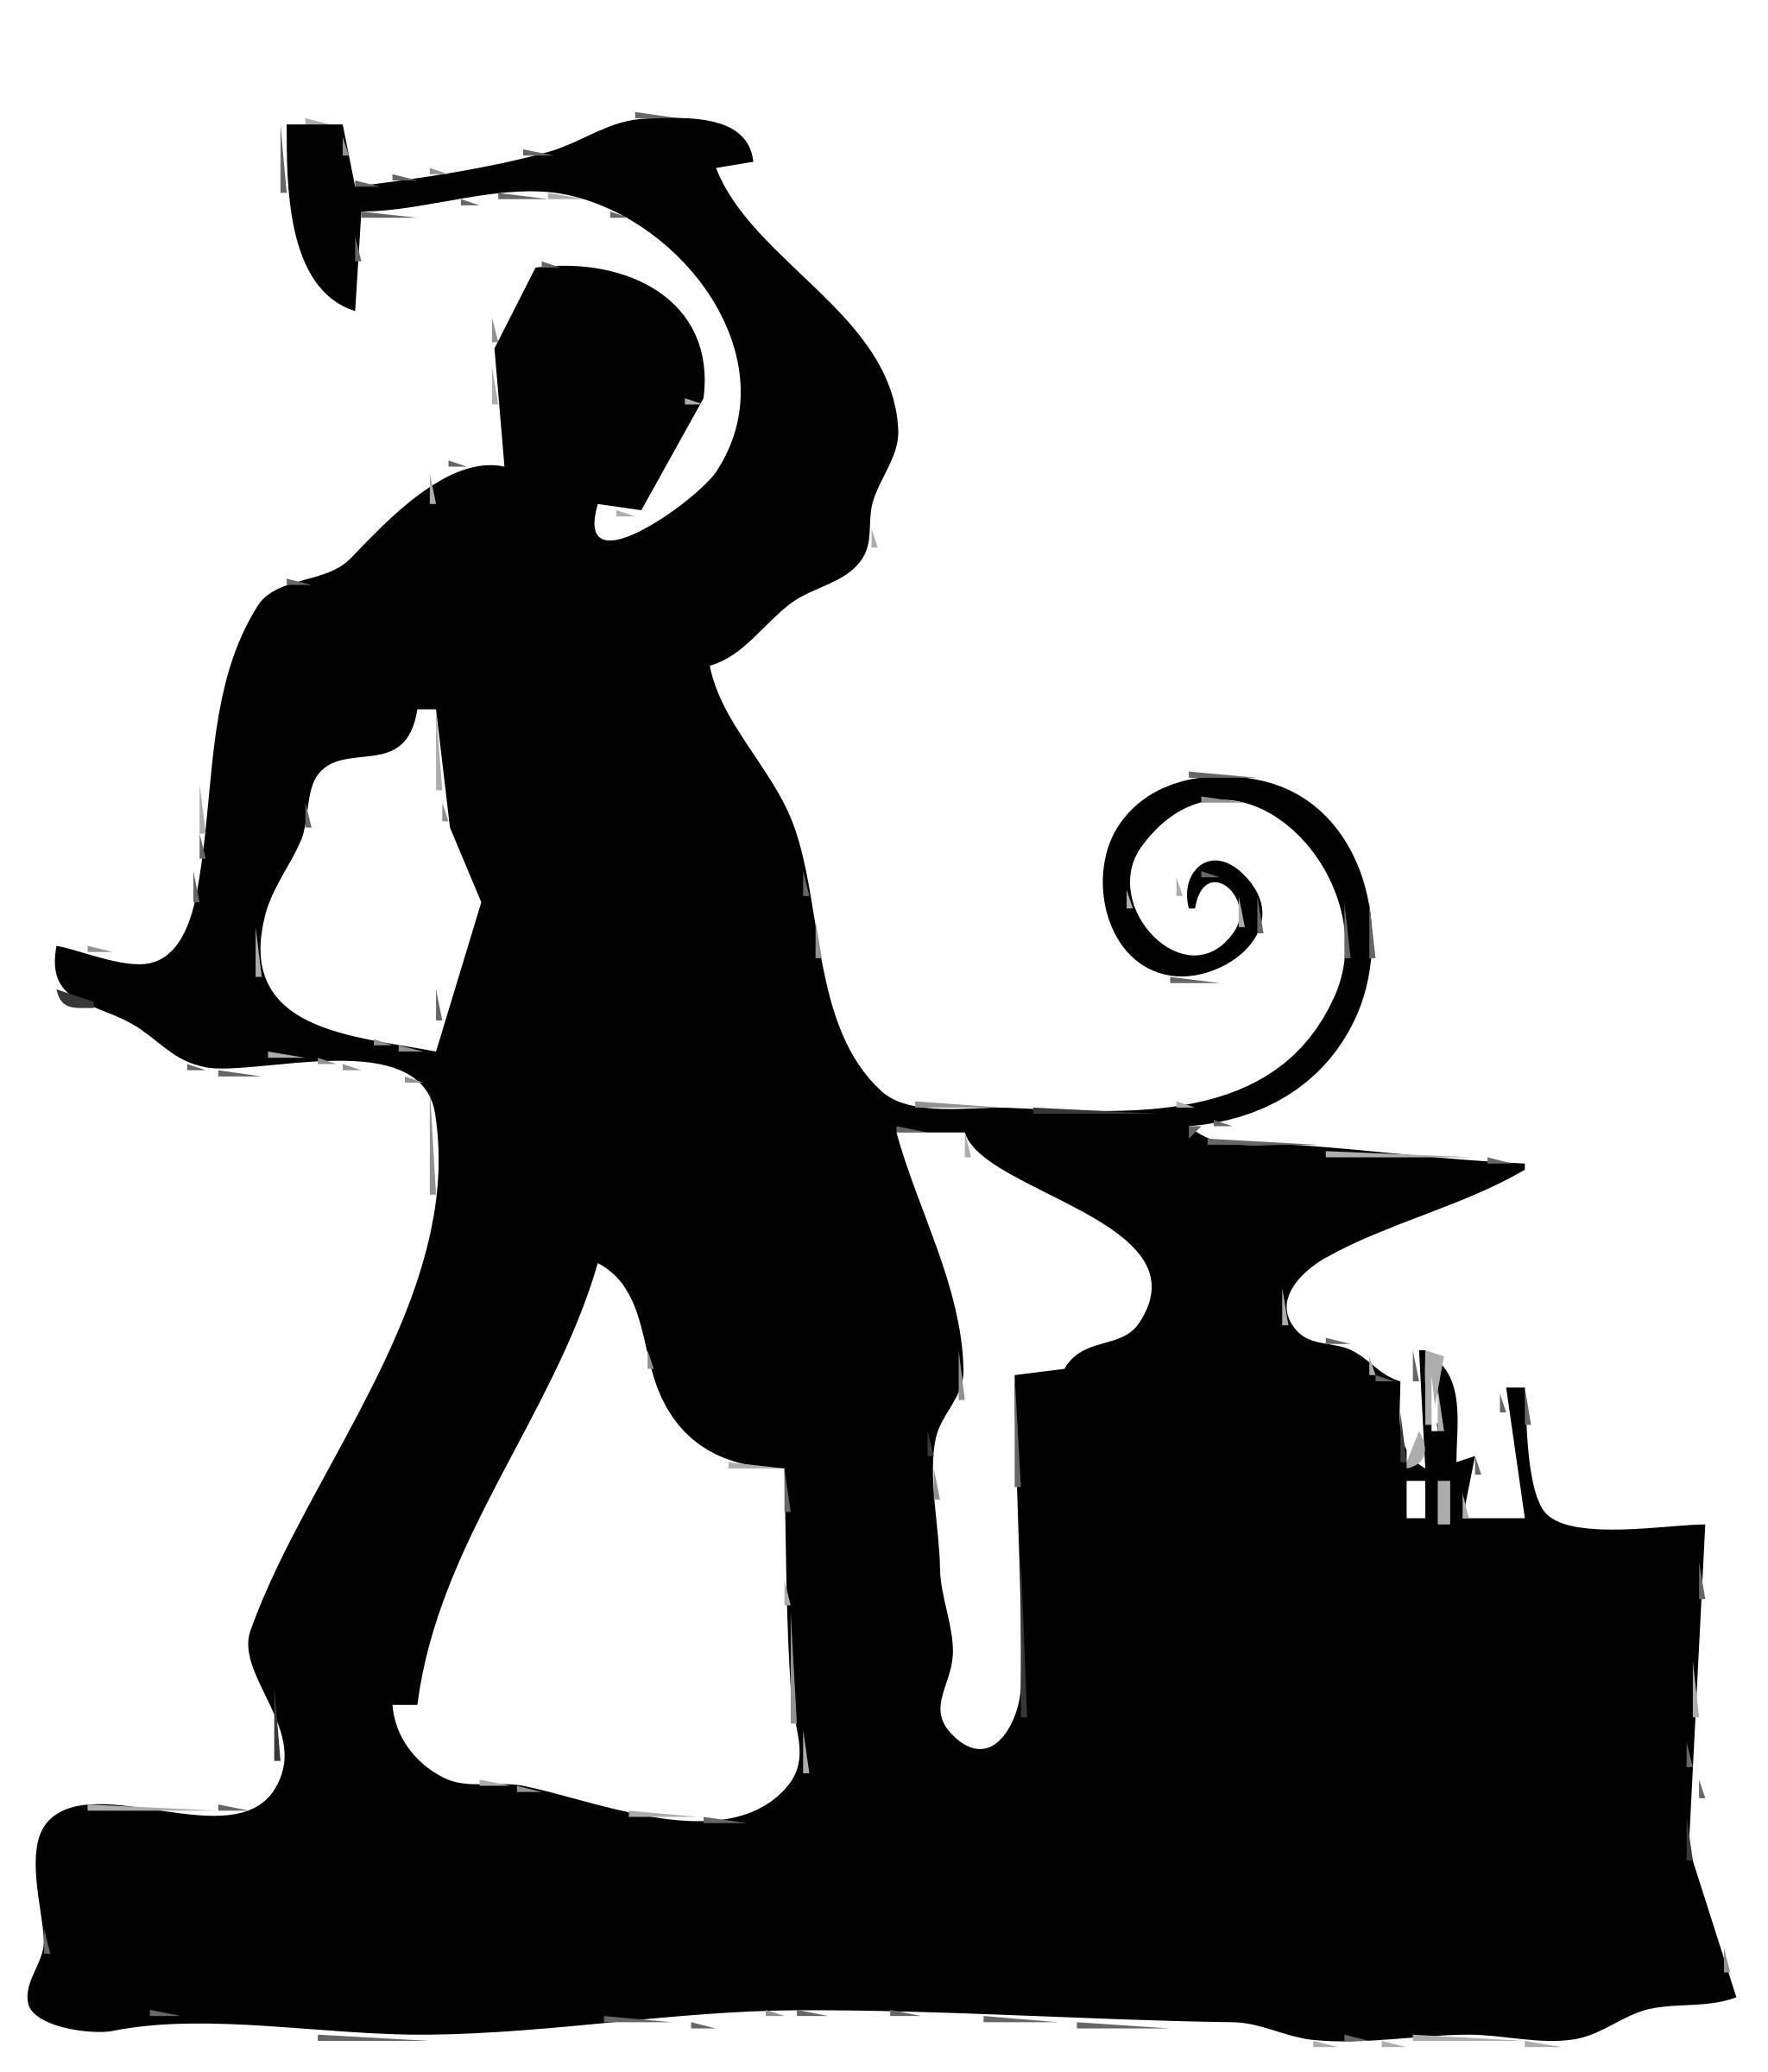 Cilpart nonsensical clip art. Anvil clipart blacksmith tool